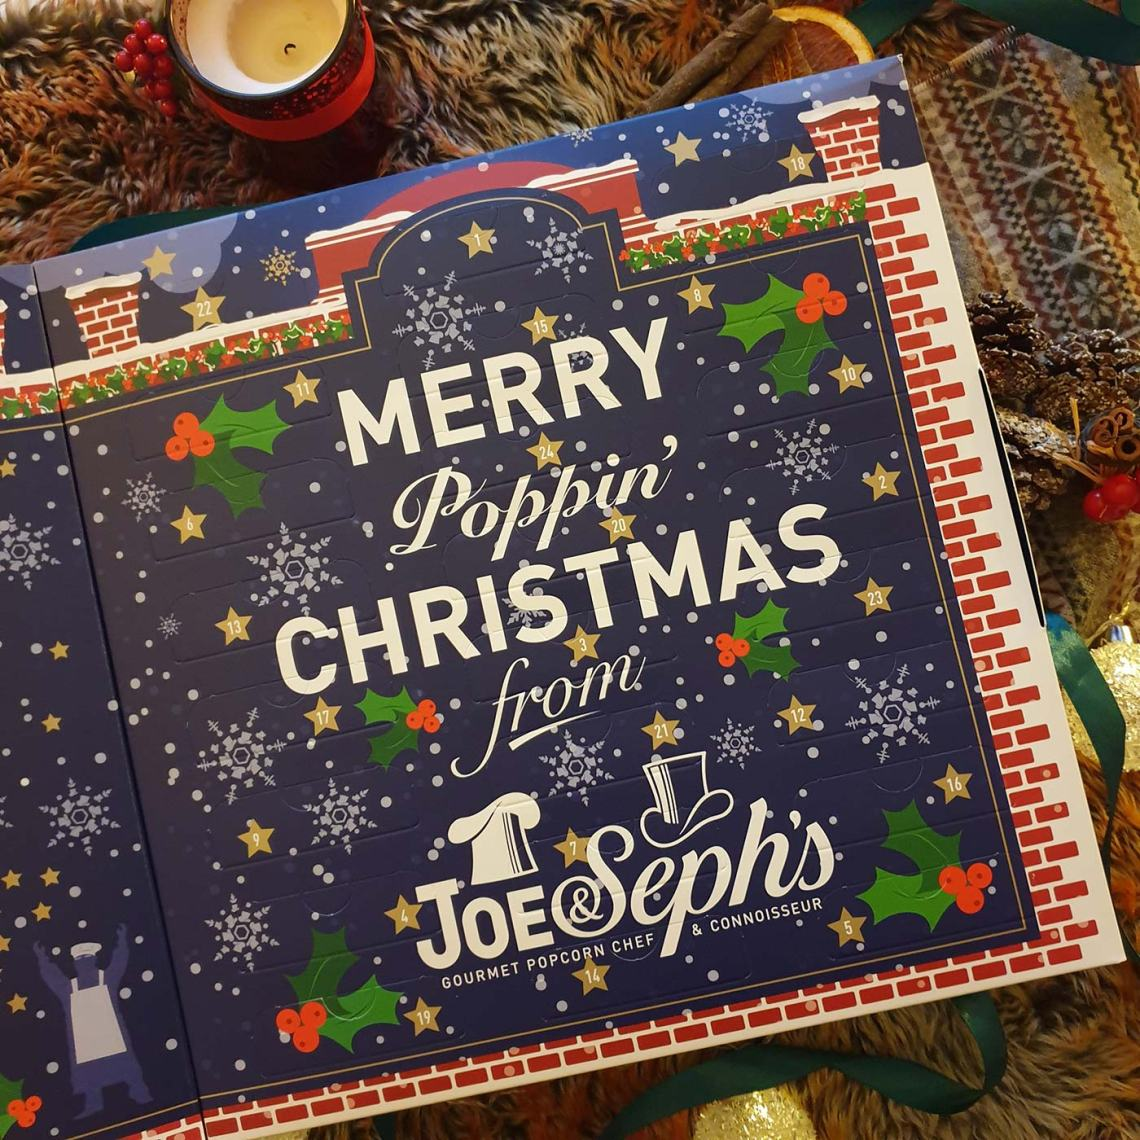 Best Foodie Advent Calendars - Joe & Seph's, Merry Poppin' Christmas - Female Original